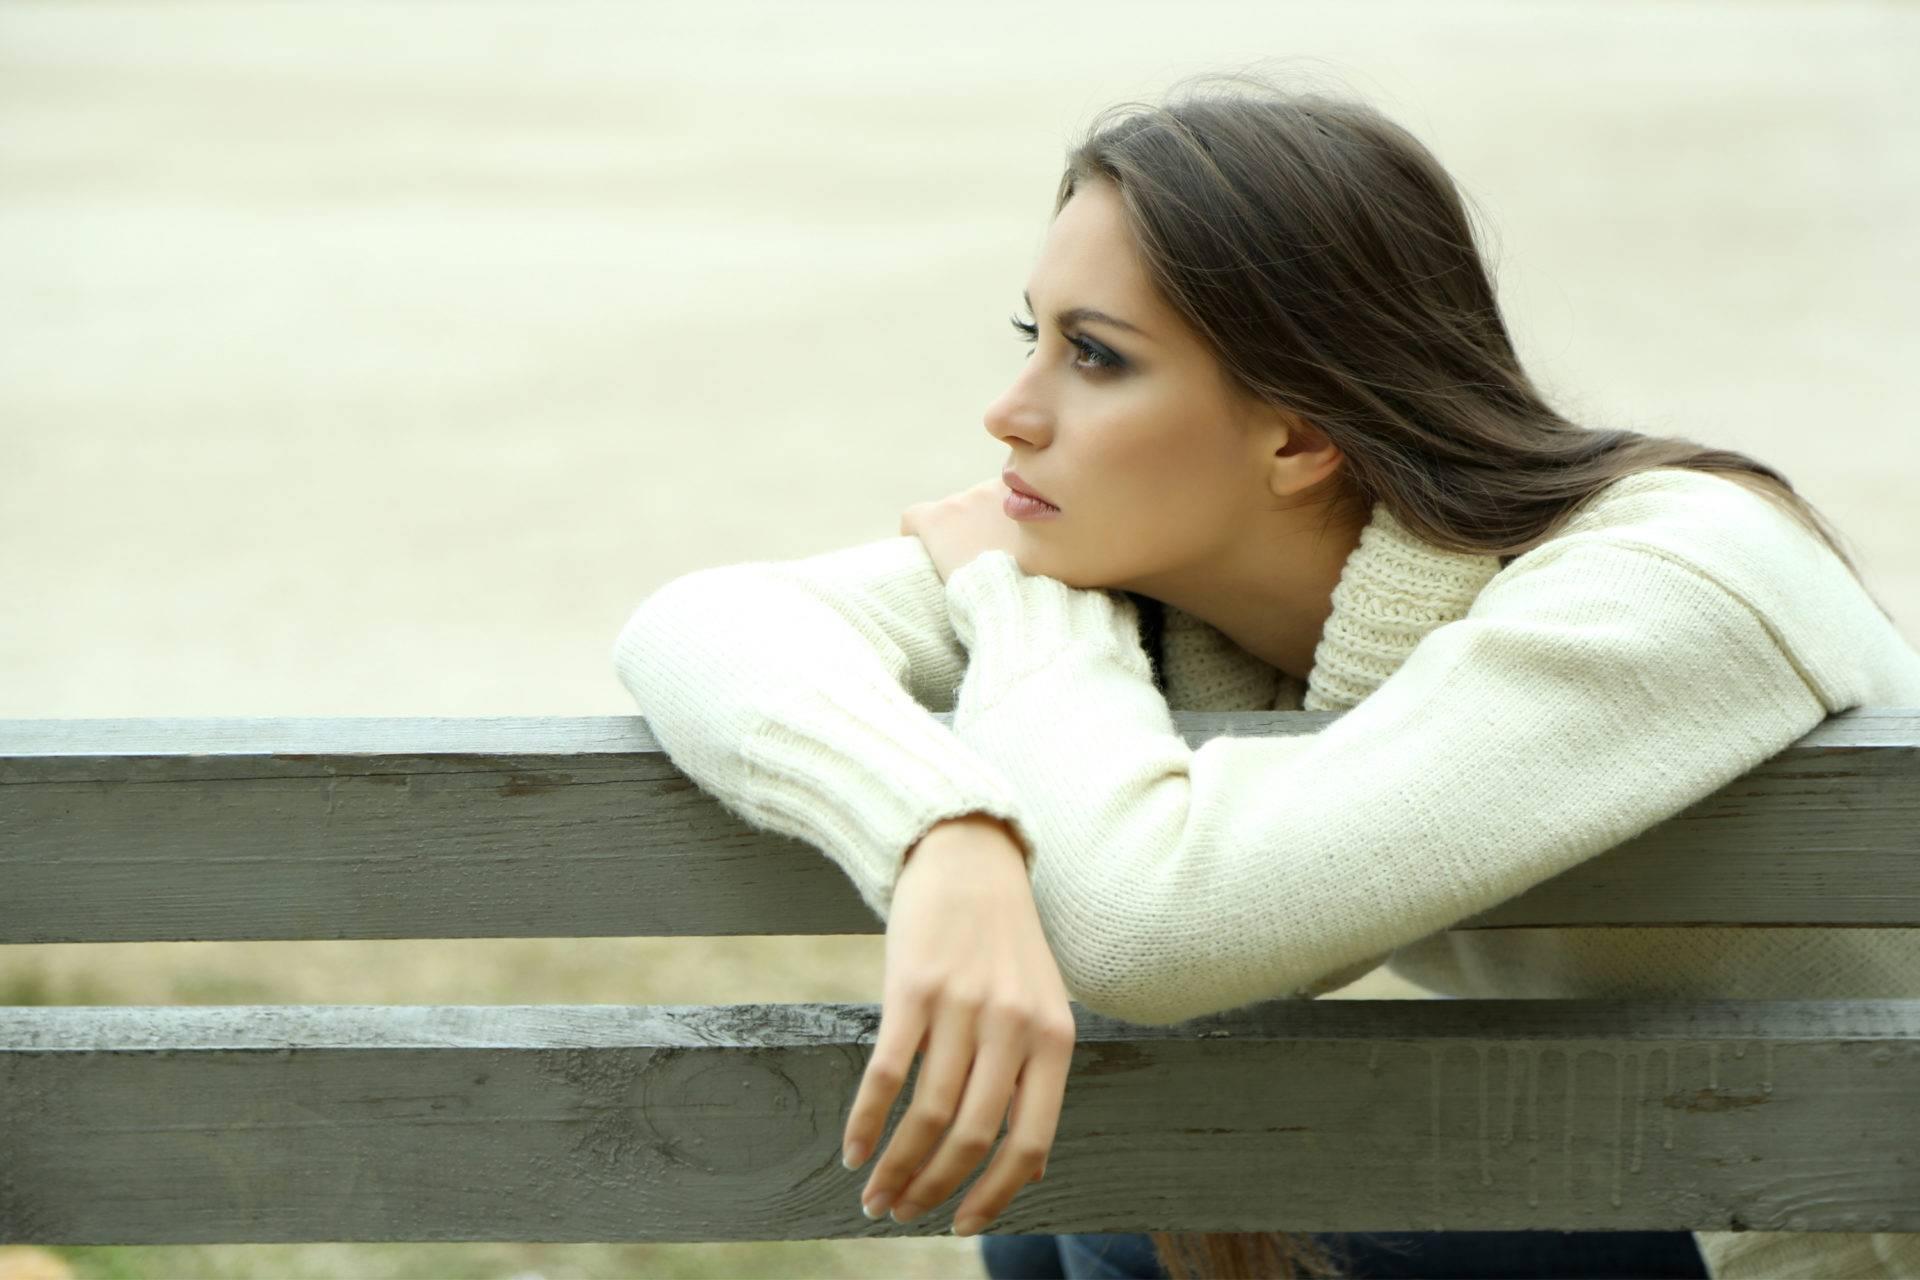 Одинокие девушки. почему красивые девушки одиноки